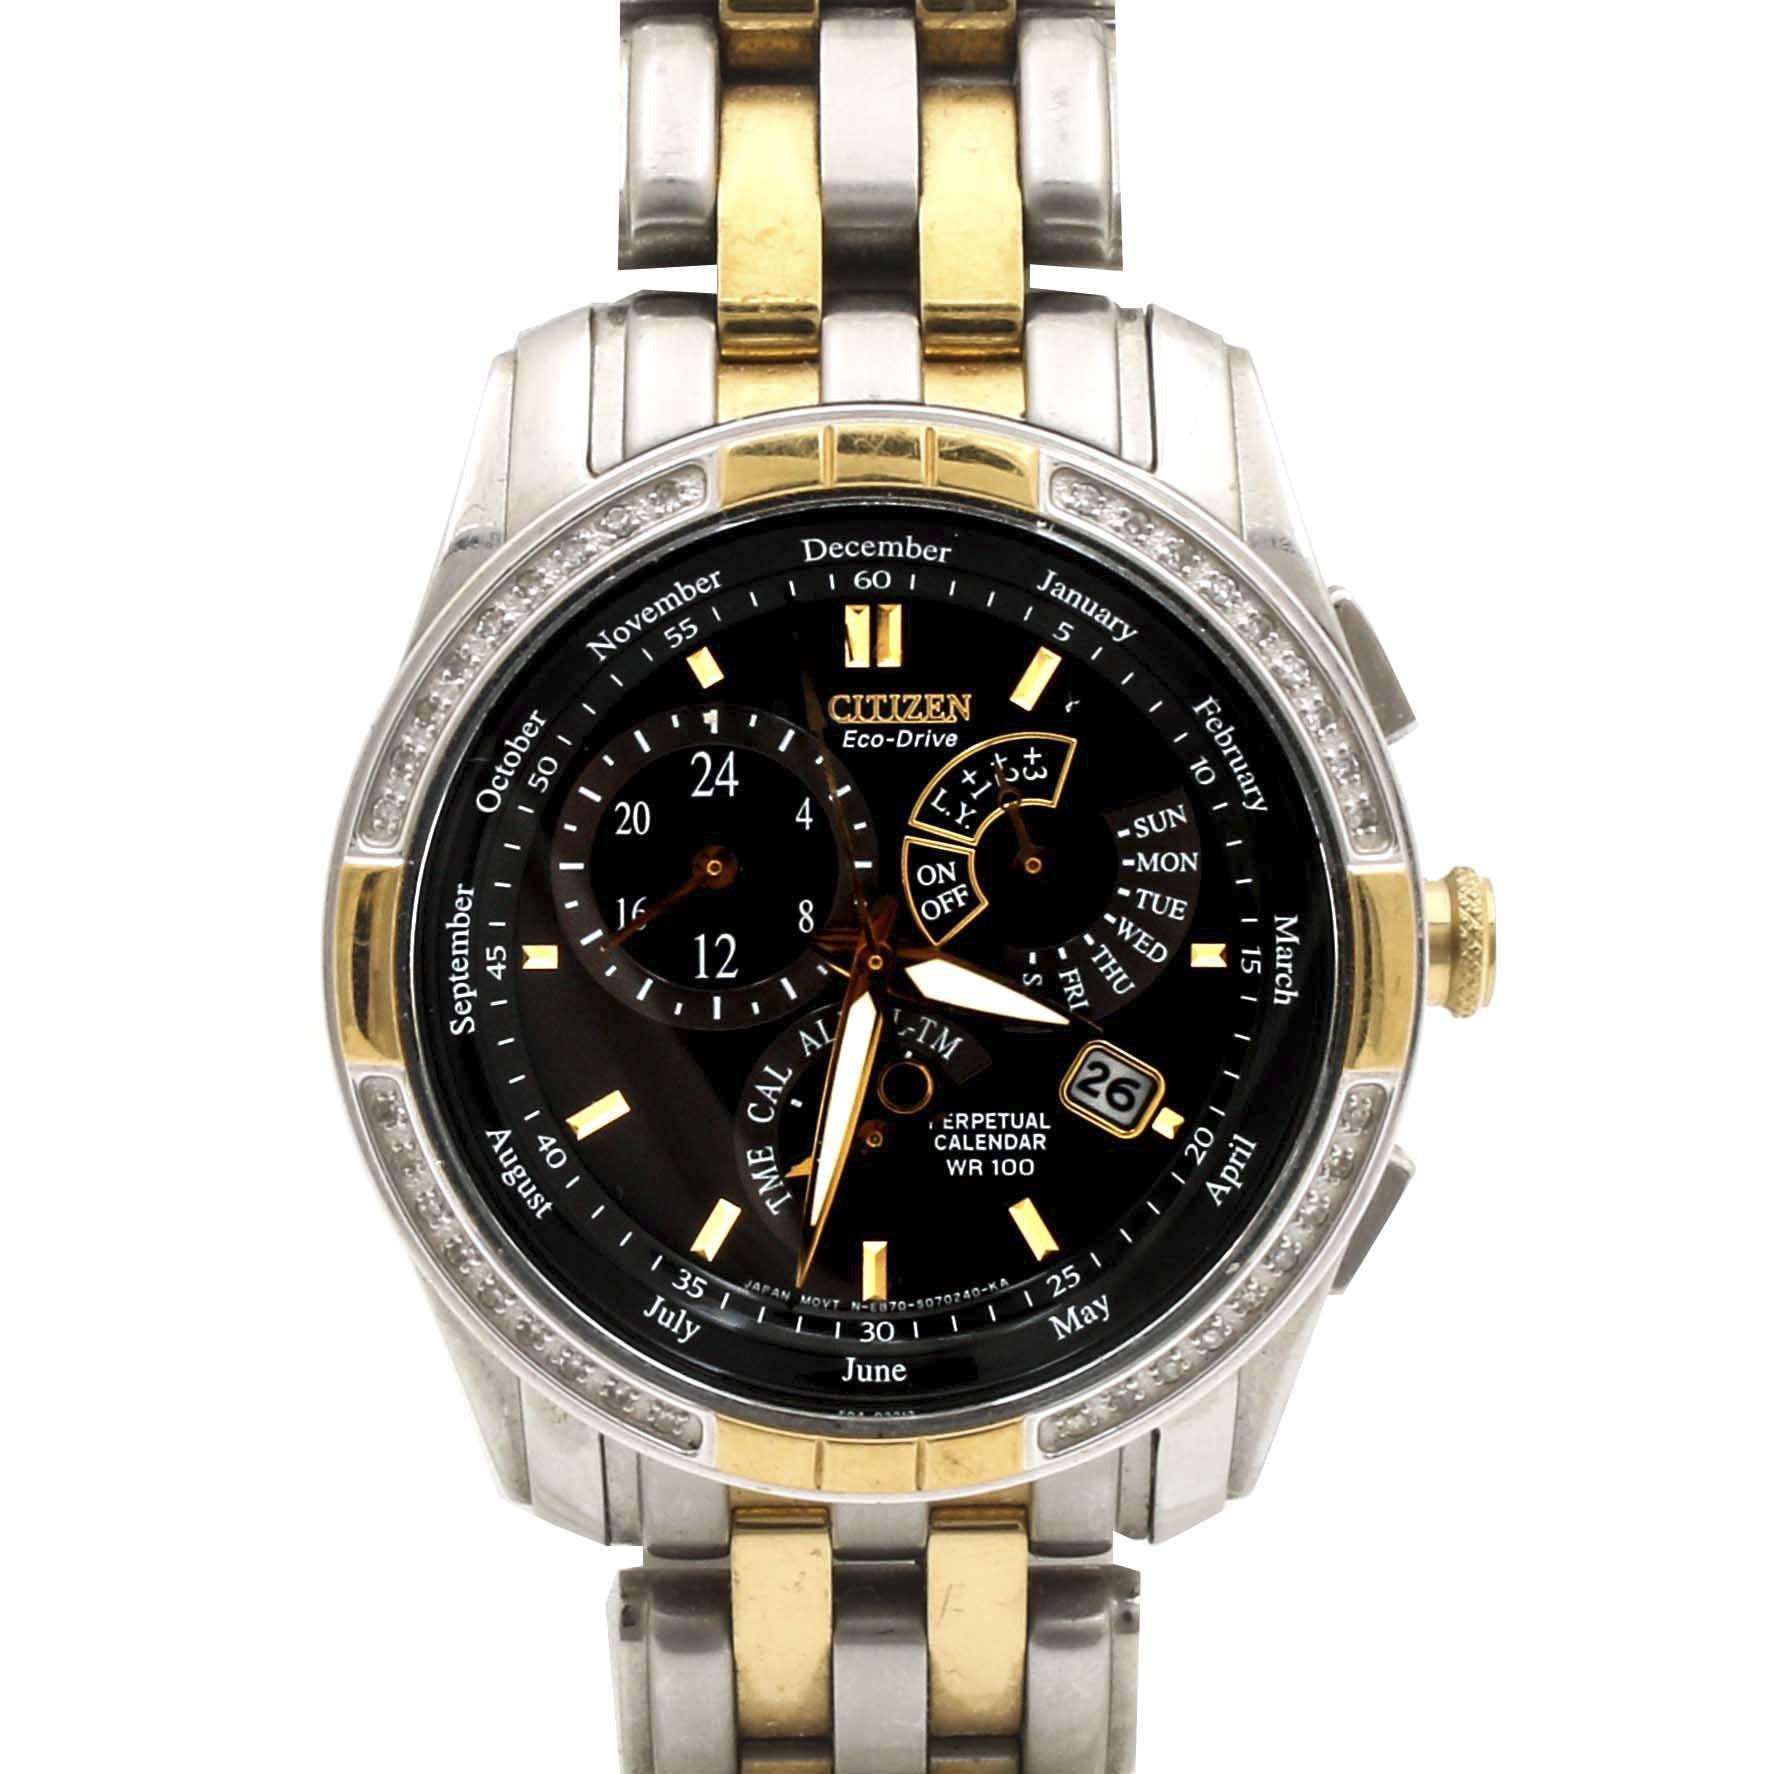 Citizen Eco-Drive Perpetual Calendar Diamond Wristwatch